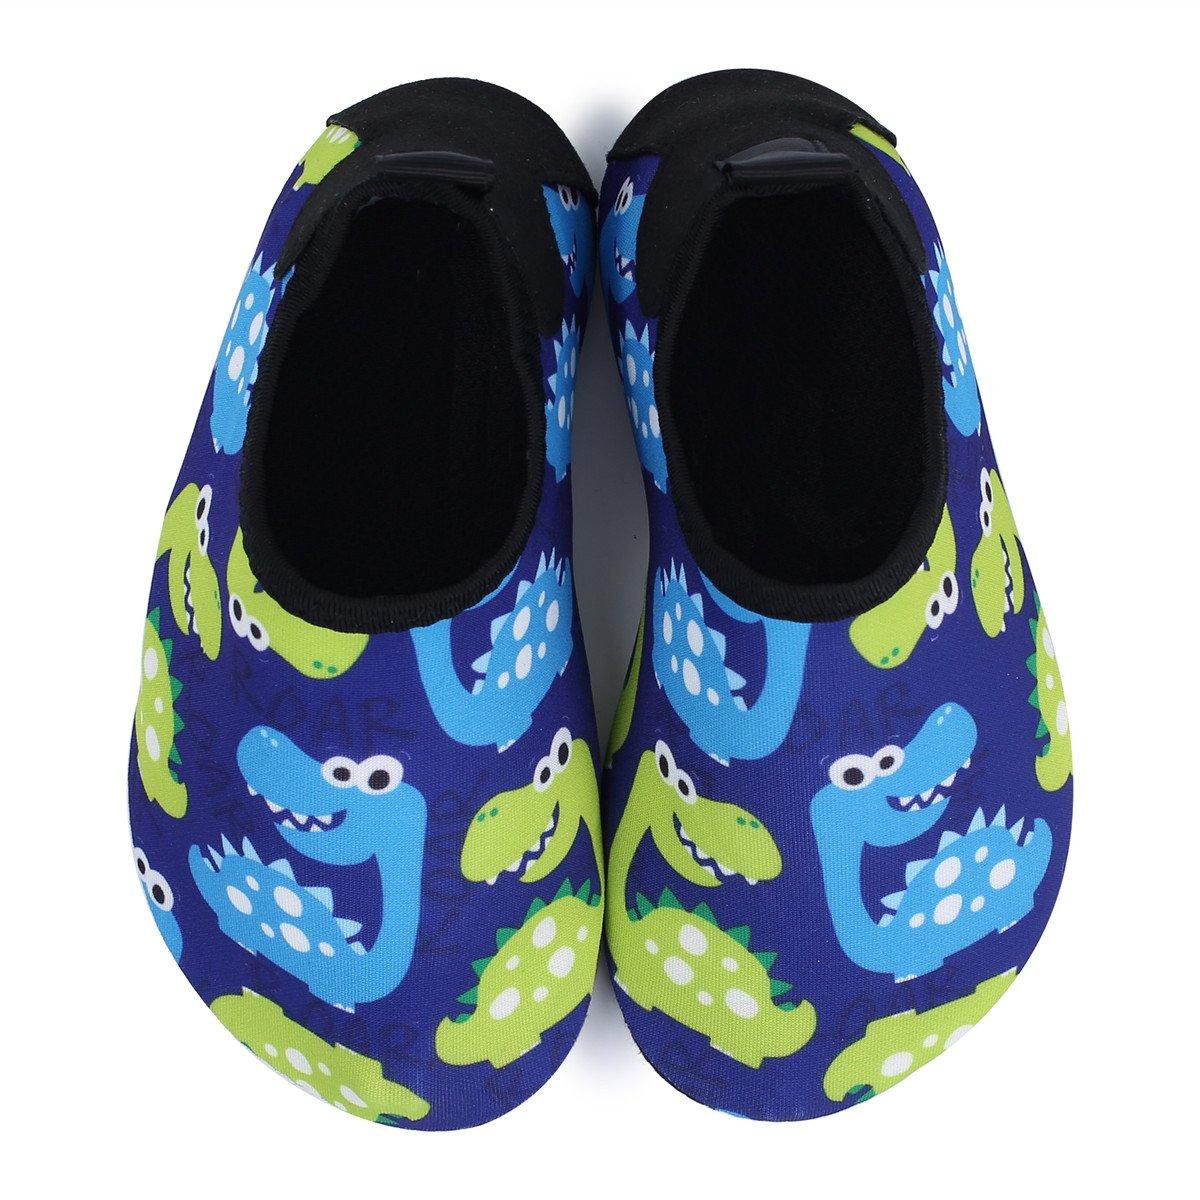 JIASUQI Kinder Jungen M/ädchen Wasser Aqua Schuhe Schnell trocken Barfu/ß Aqua Socken f/ür Strand Schwimmbad